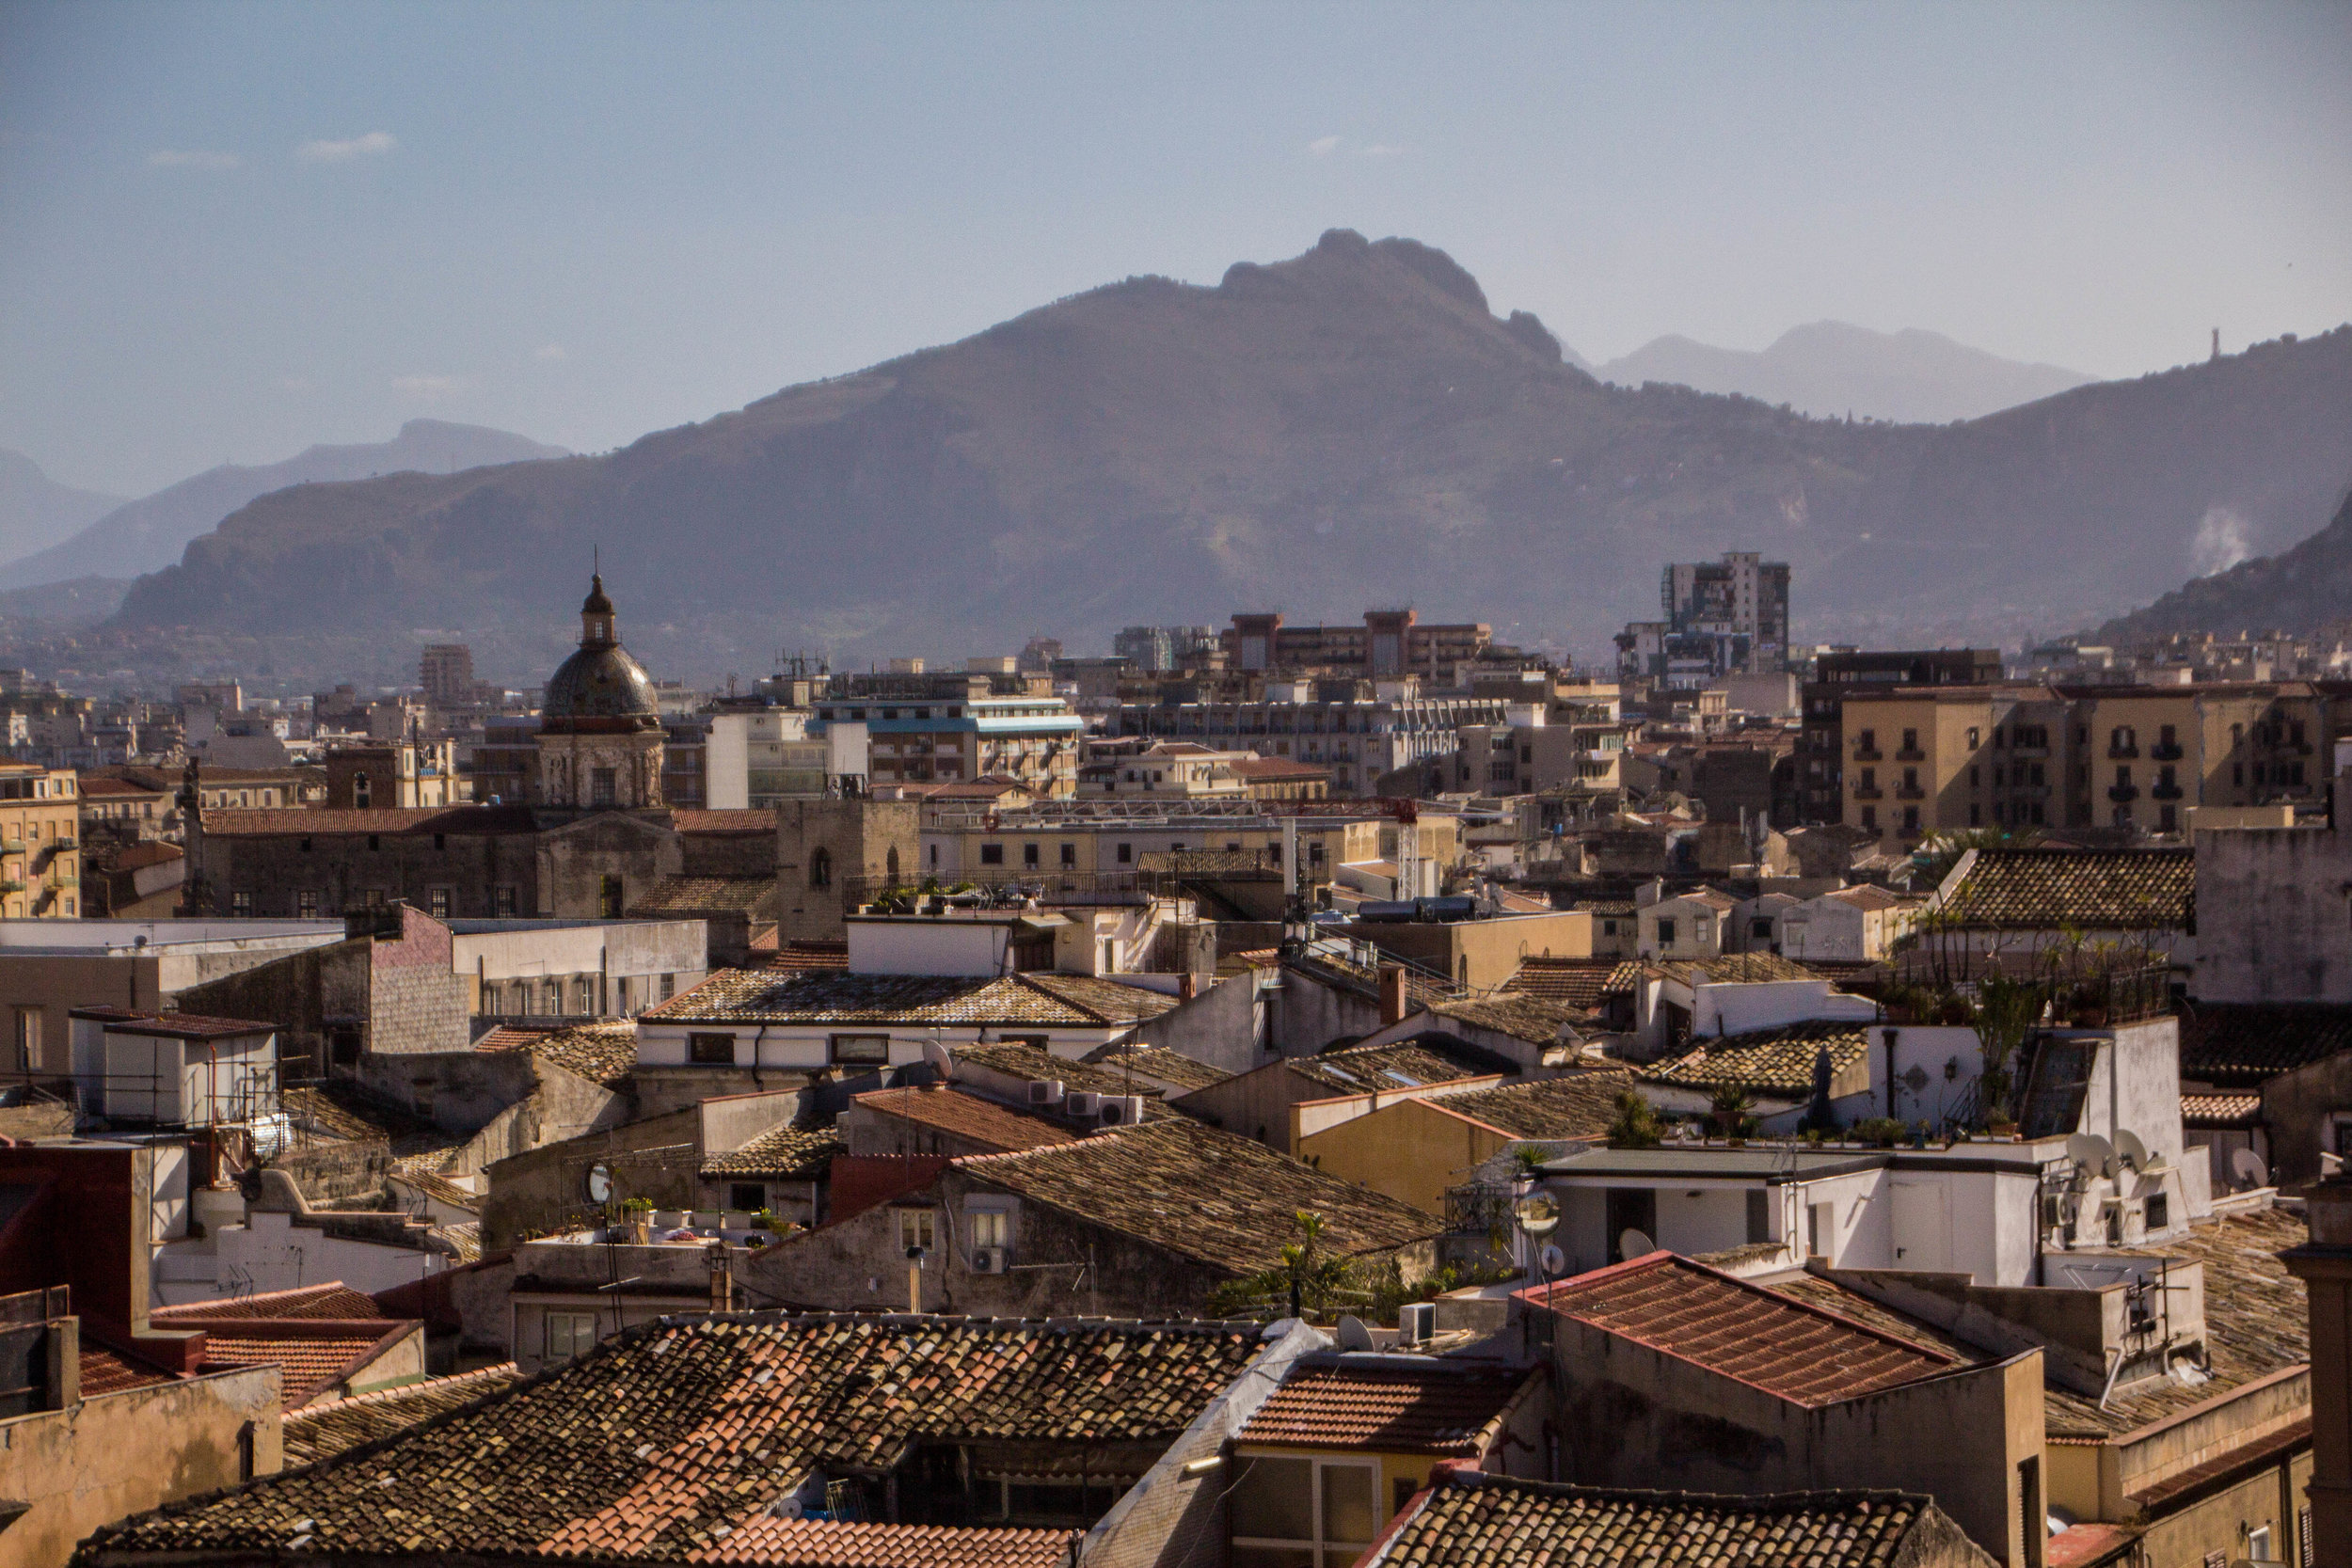 cattedrale-santa-vergine-maria-palermo-sicily -12.jpg